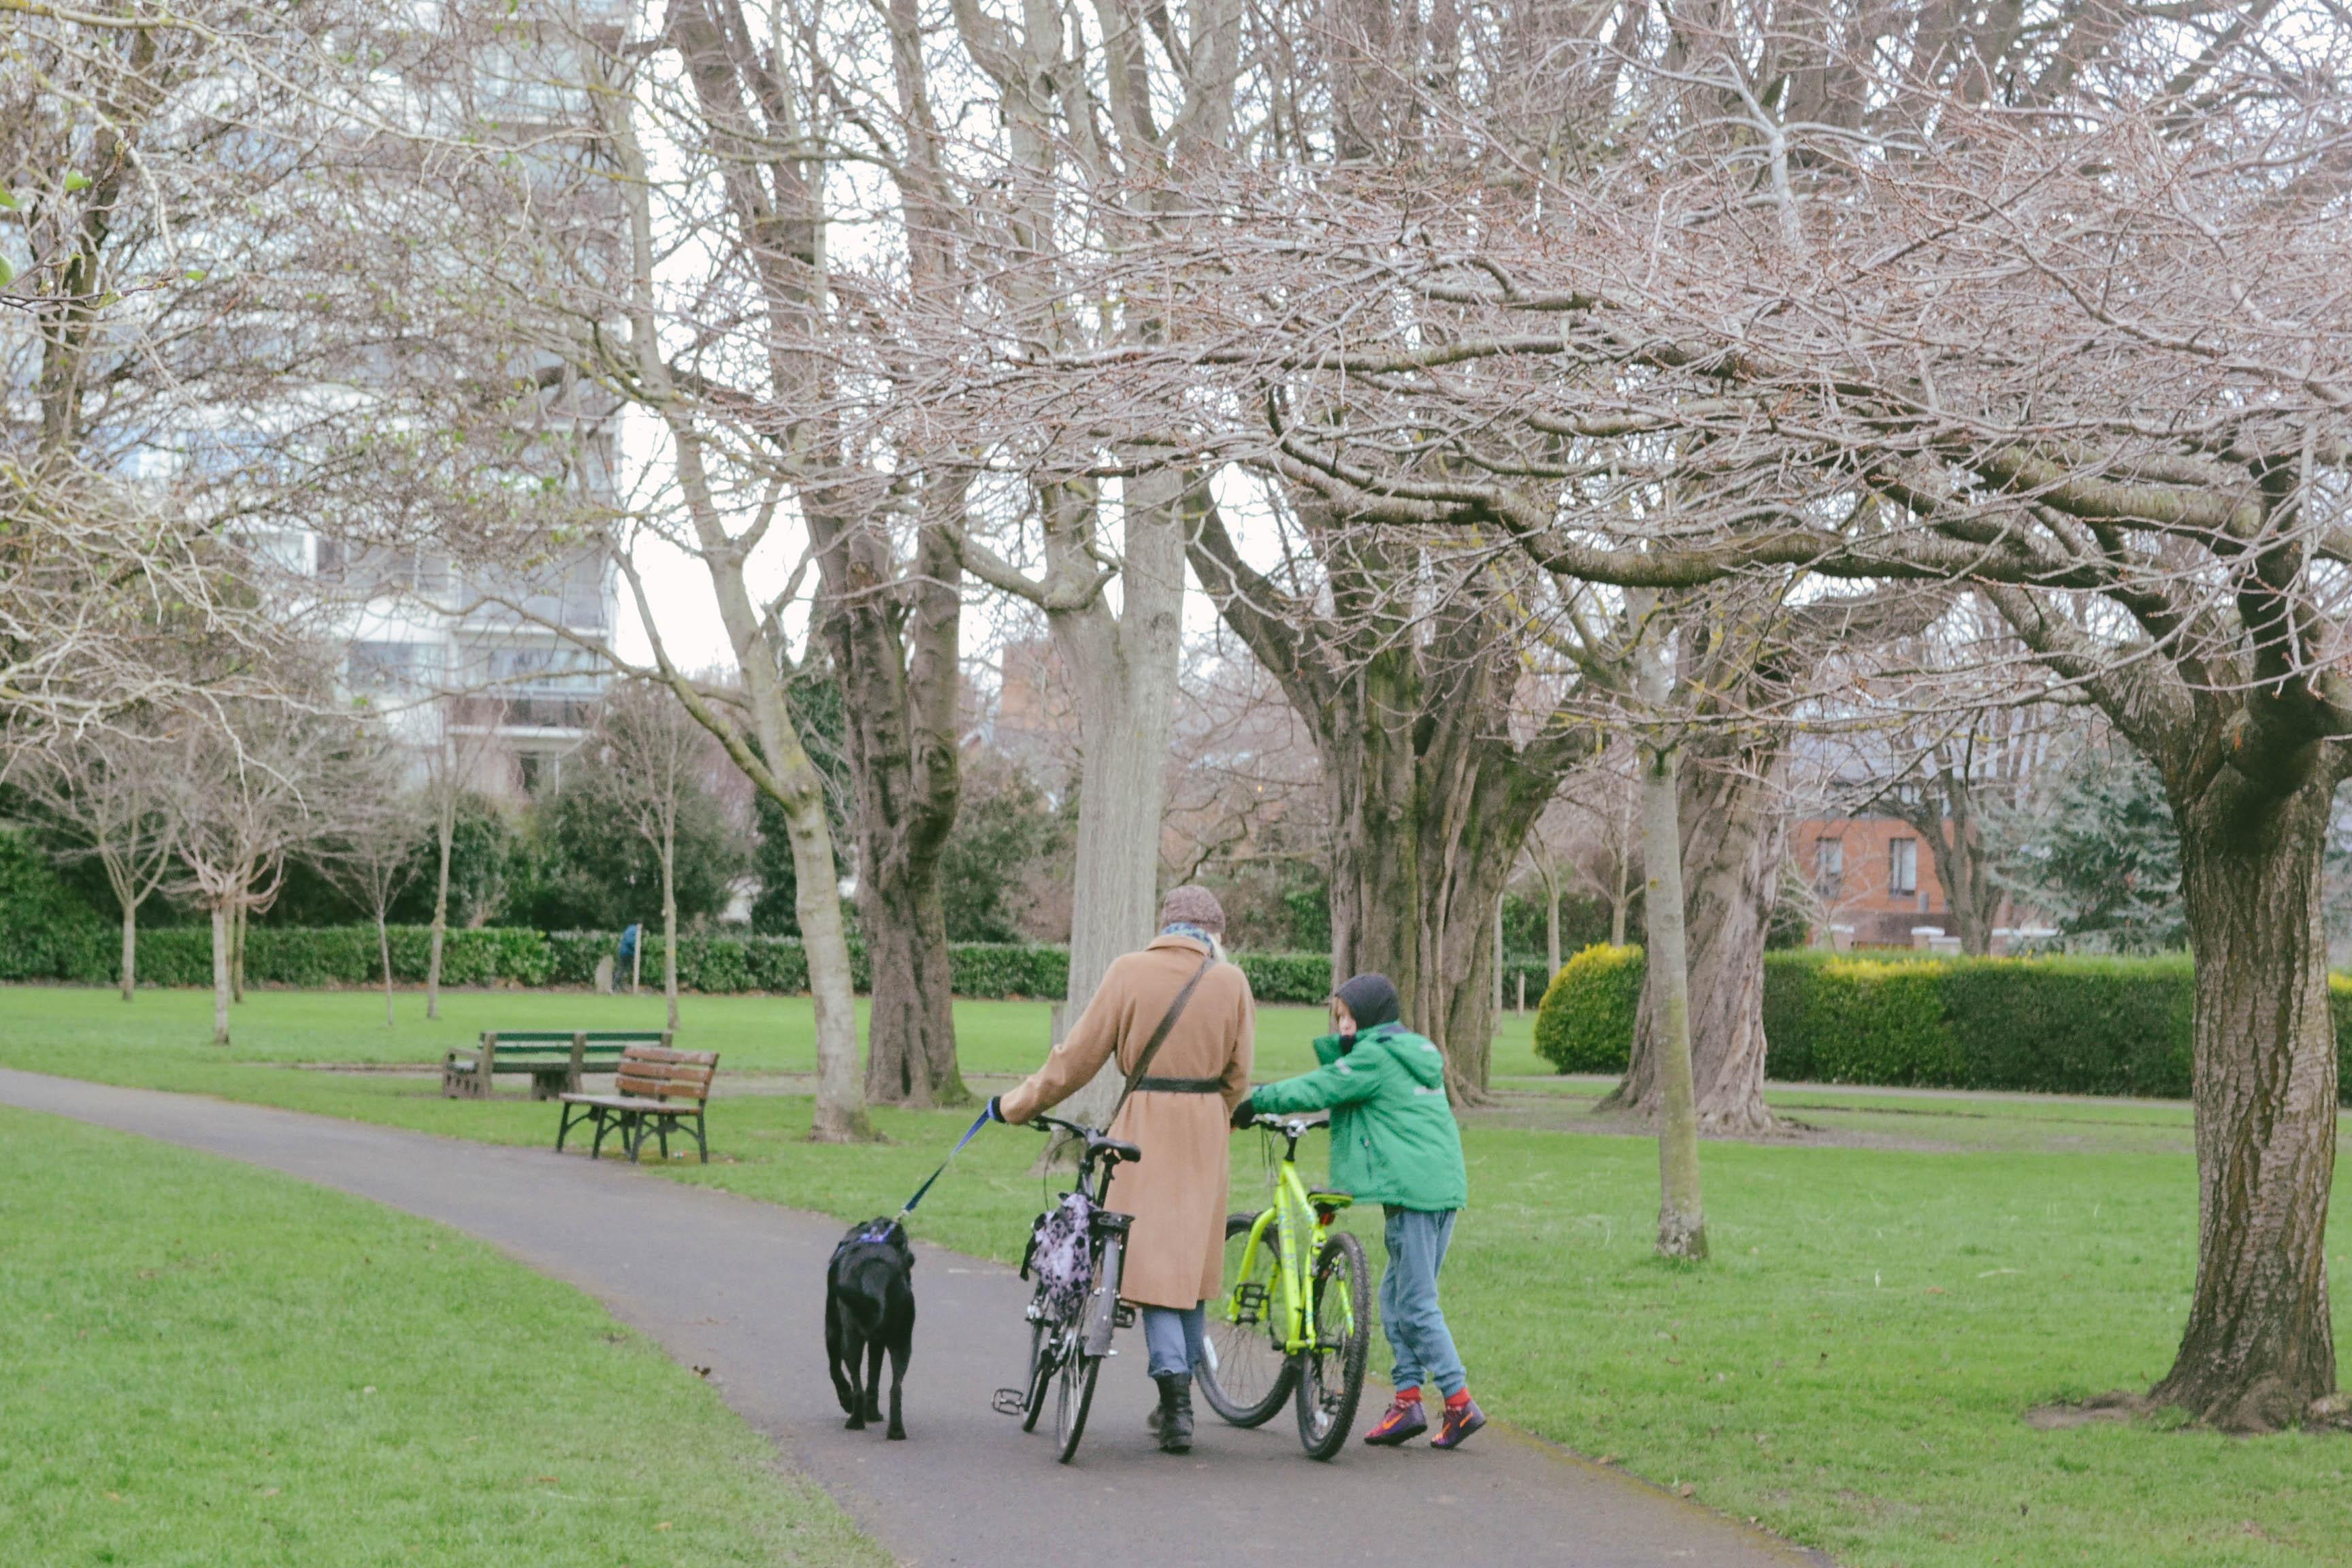 feira-comida-market-herbert-park-ballsbridge-passeio-domingo-sunday-food-park-dublin-ireland-irlanda-dicas_-14